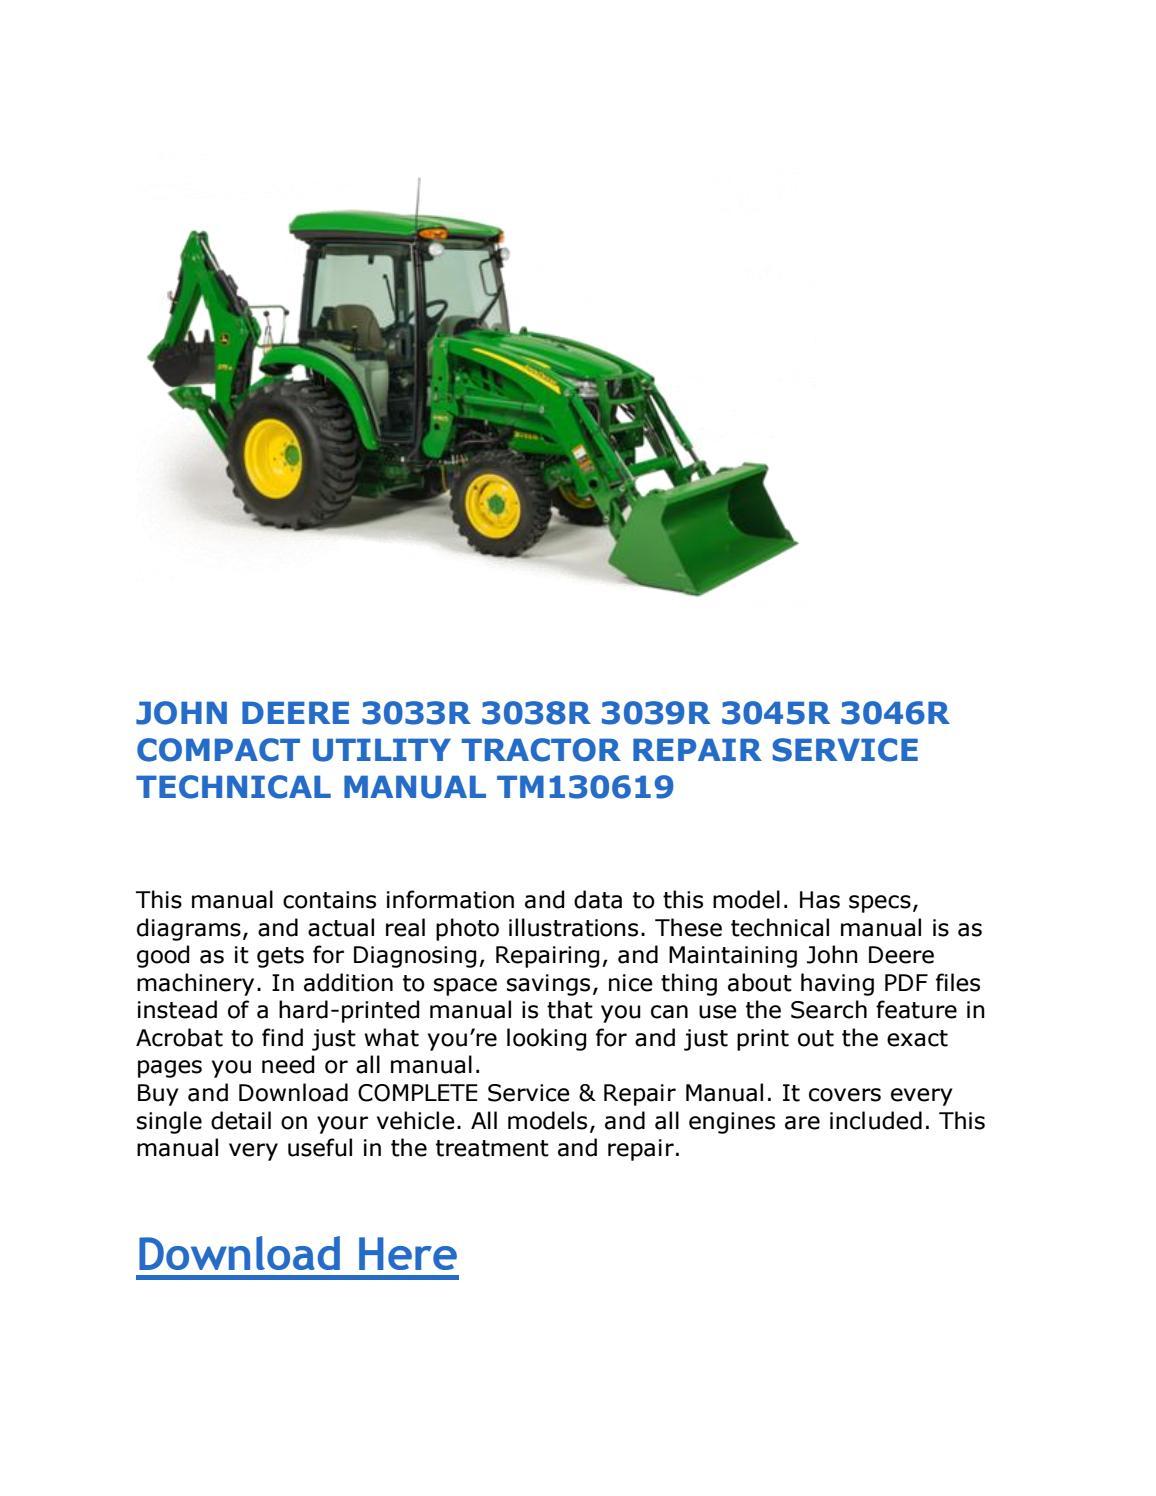 John Deere 3033r 3038r 3039r 3045r 3046r Compact Utility Tractor Repair Service Technical Manual